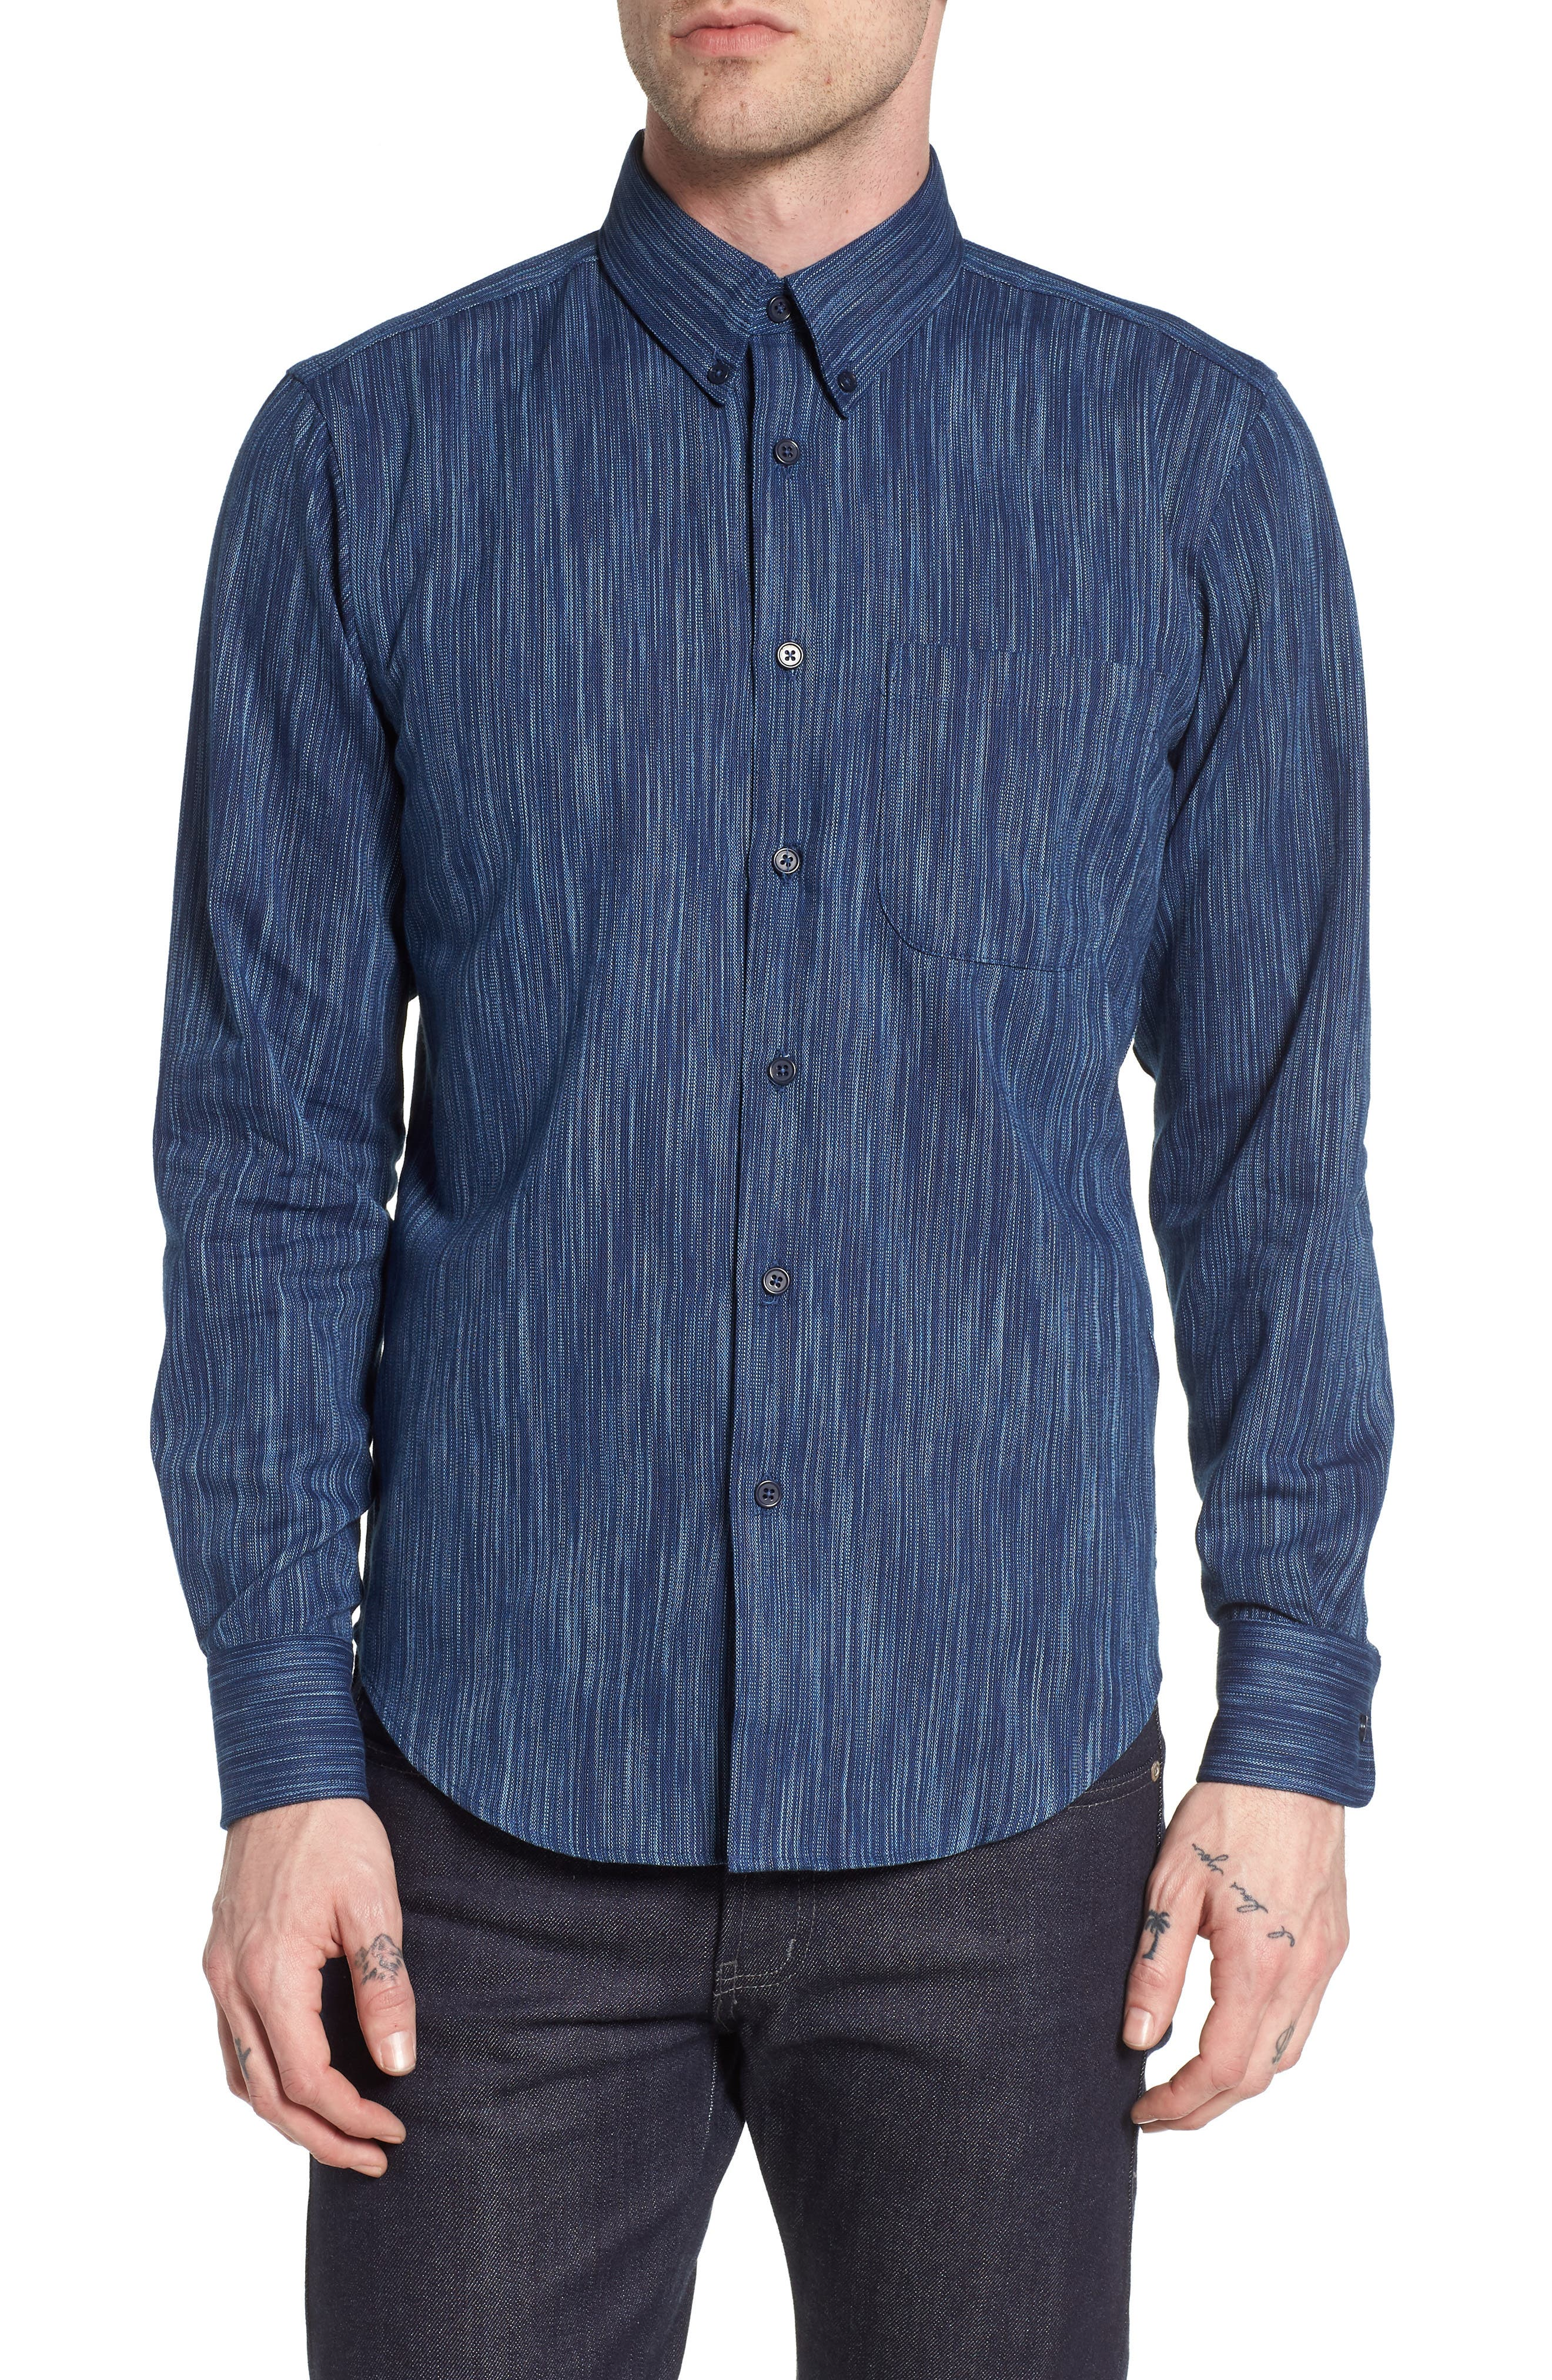 Indigo Tie Dye Rain Weave Shirt,                         Main,                         color, 401